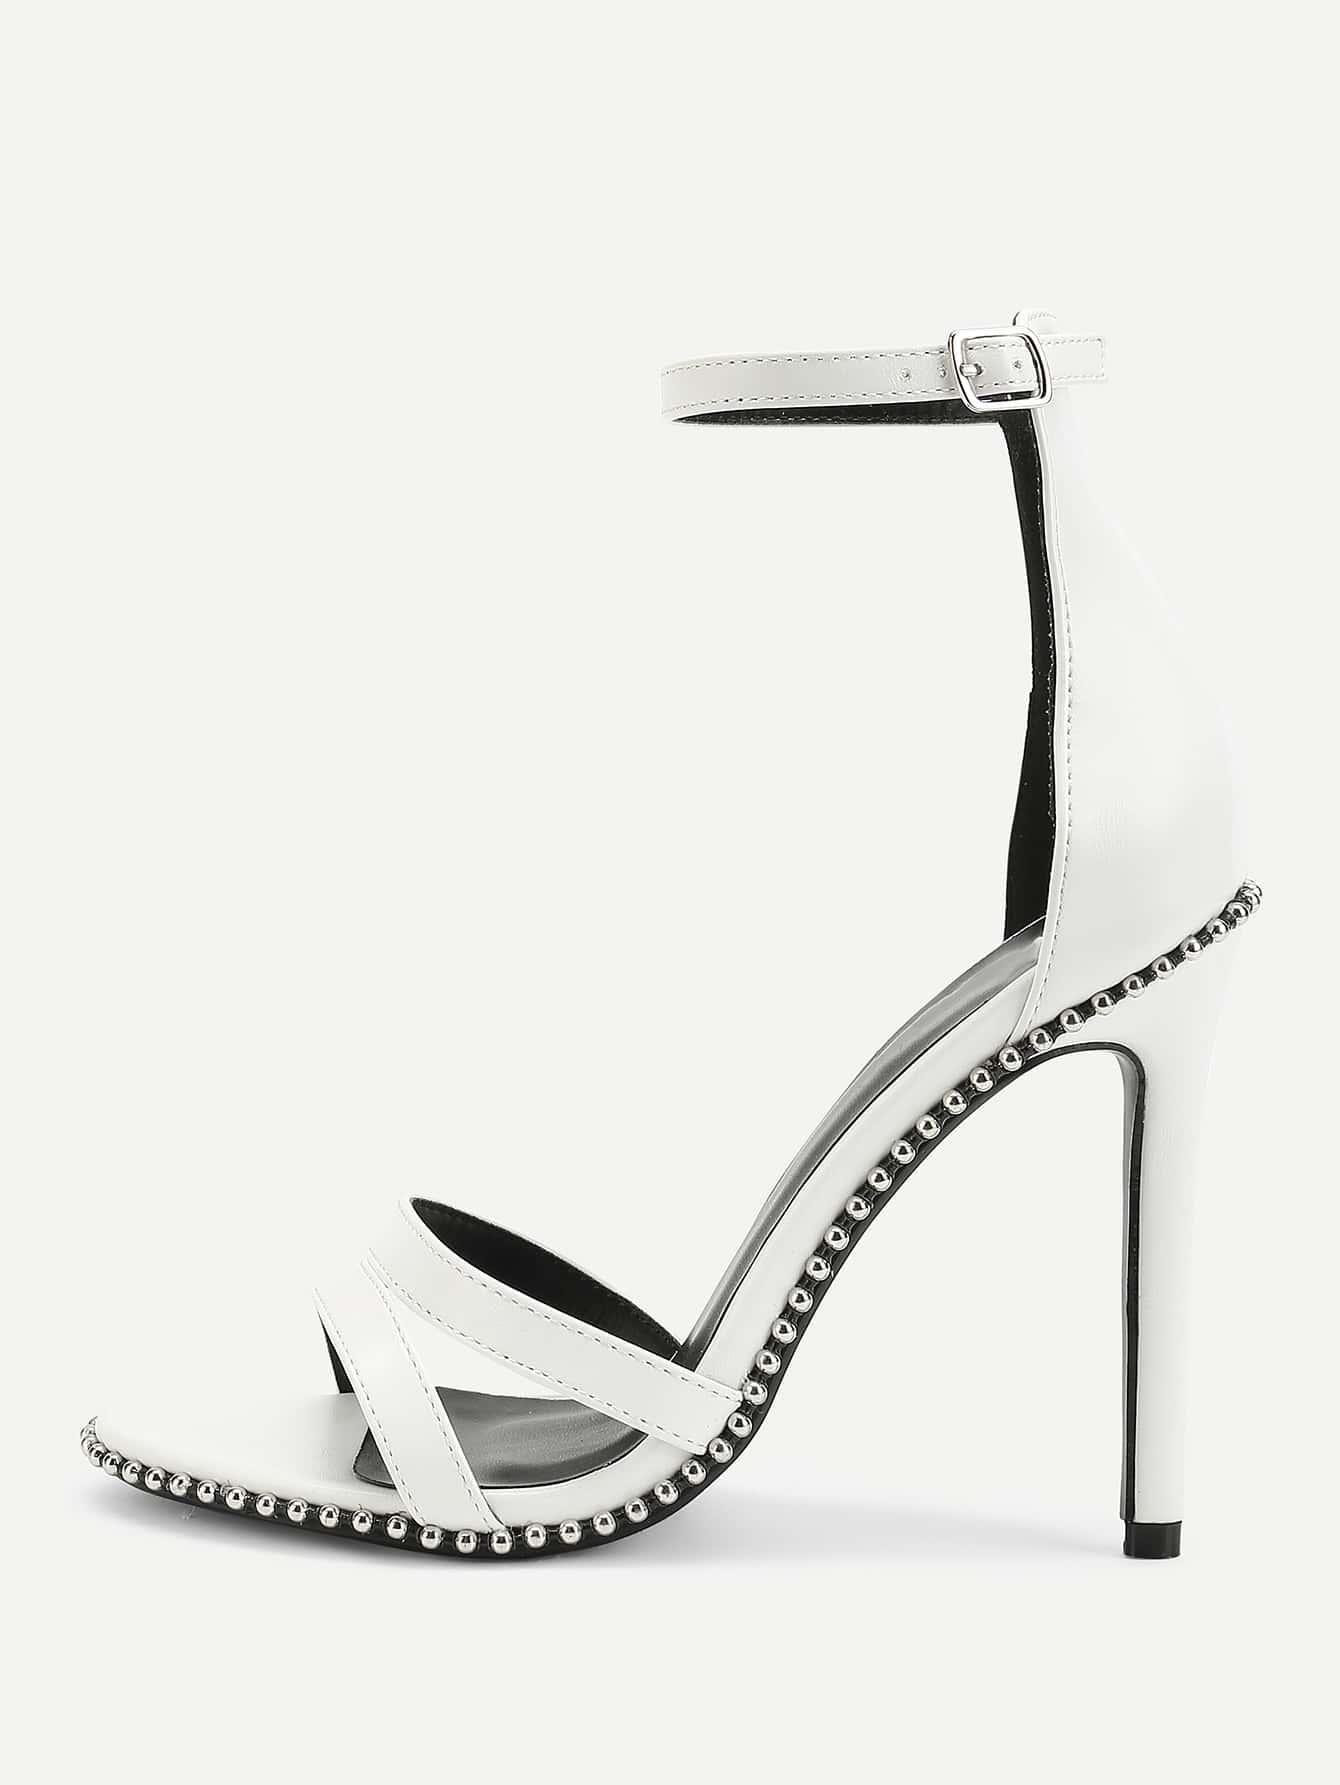 Studded Detail Ankle Strap Stiletto Heels stiletto metallic ankle strap heels